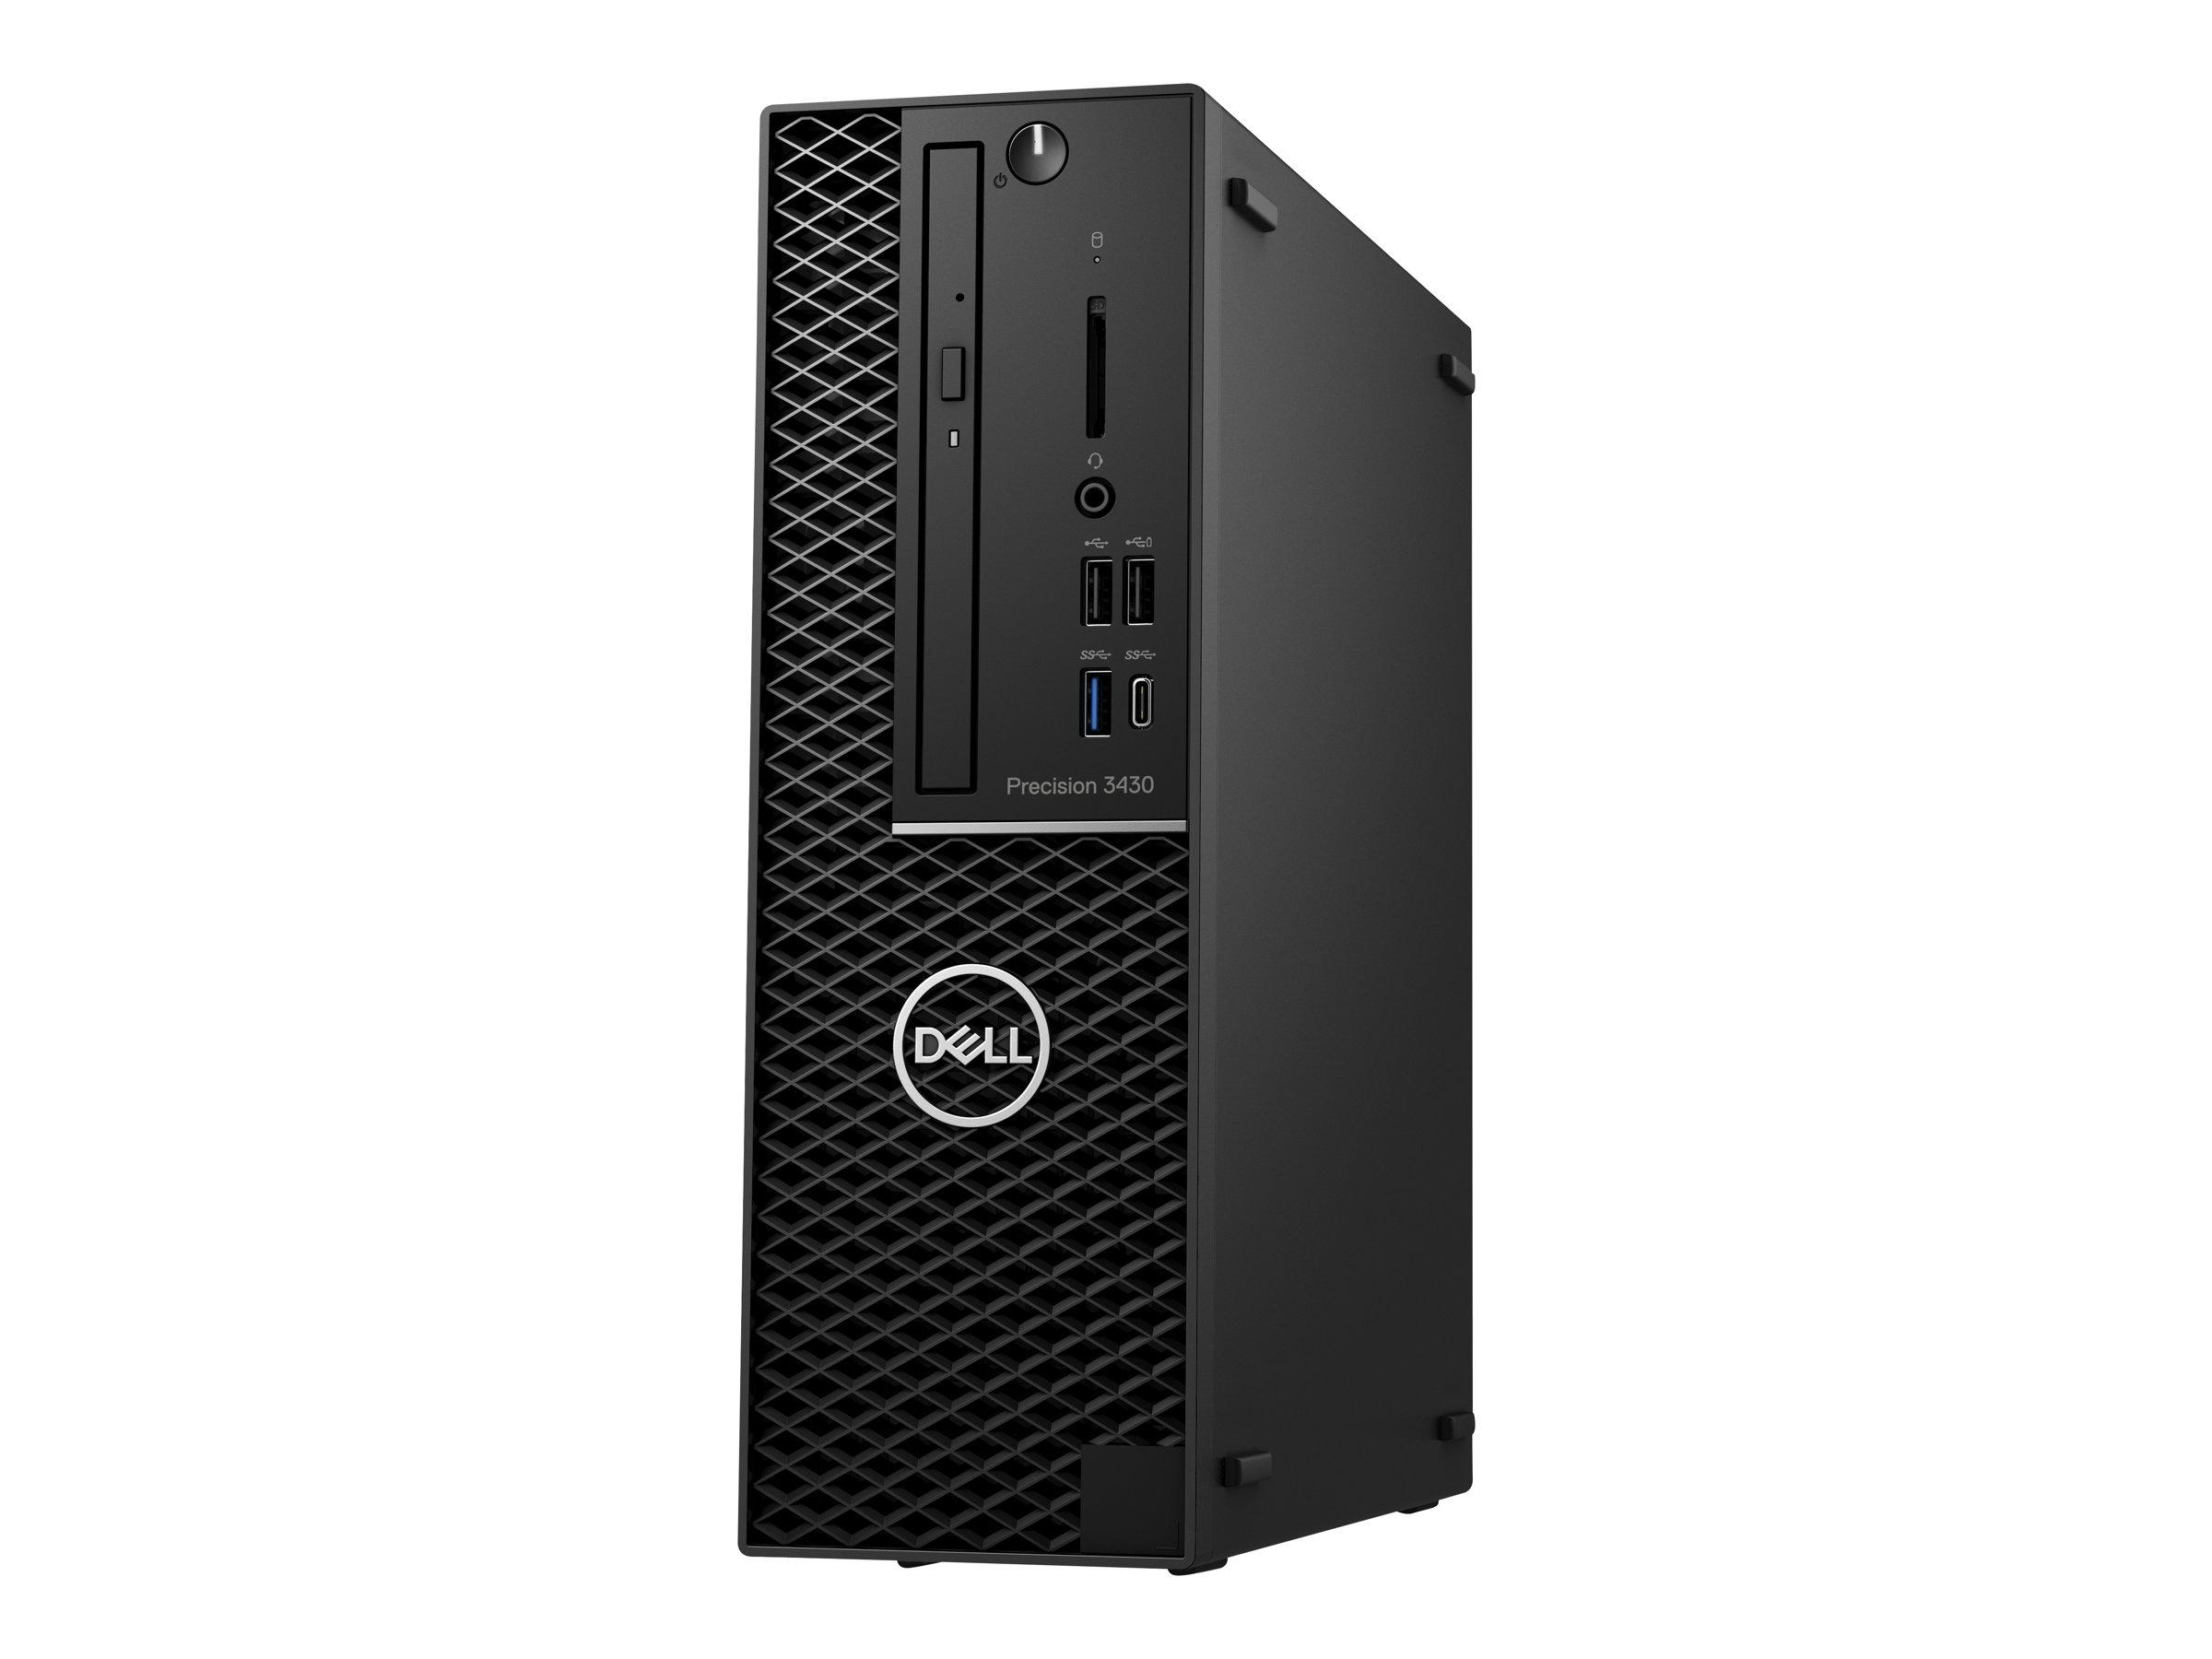 Dell Precision 3430 Small Form Factor - SFF - 1 x Core i5 8500 / 3 GHz - RAM 8 GB - HDD 1 TB - DVD-Writer - UHD Graphics